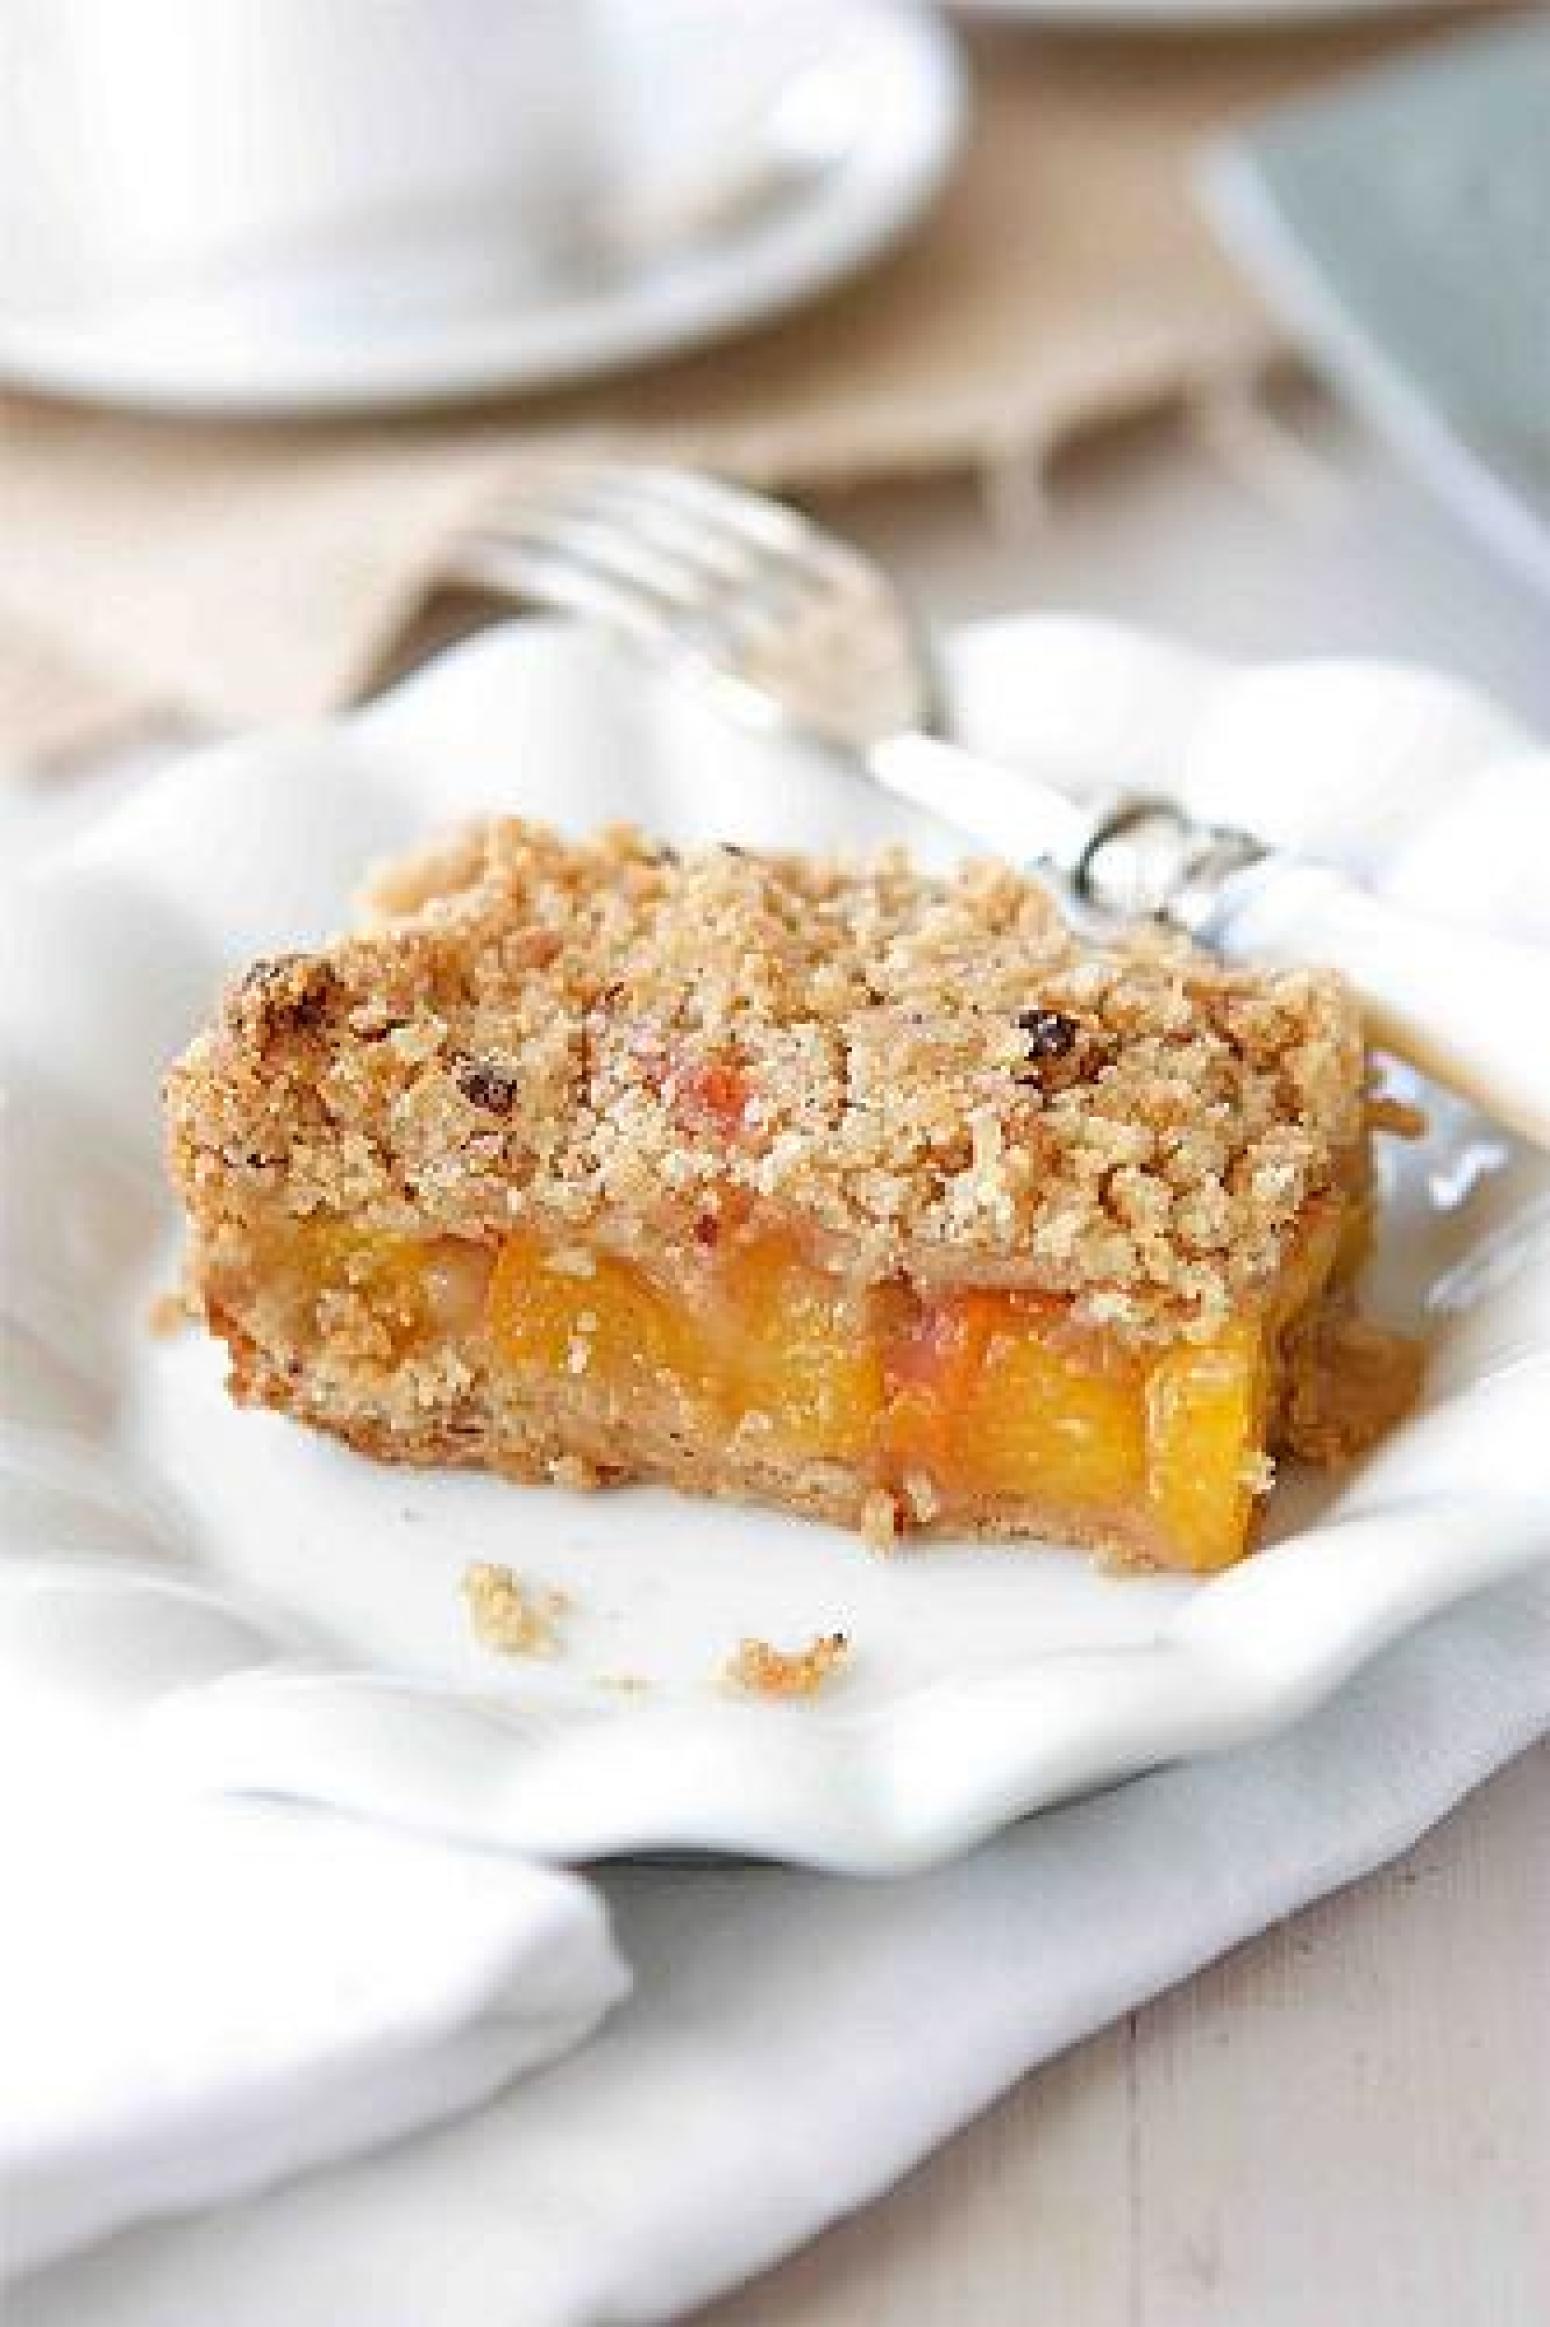 Peach Crumb Bars With Hazelnut Streusel Recipe | Just A Pinch Recipes